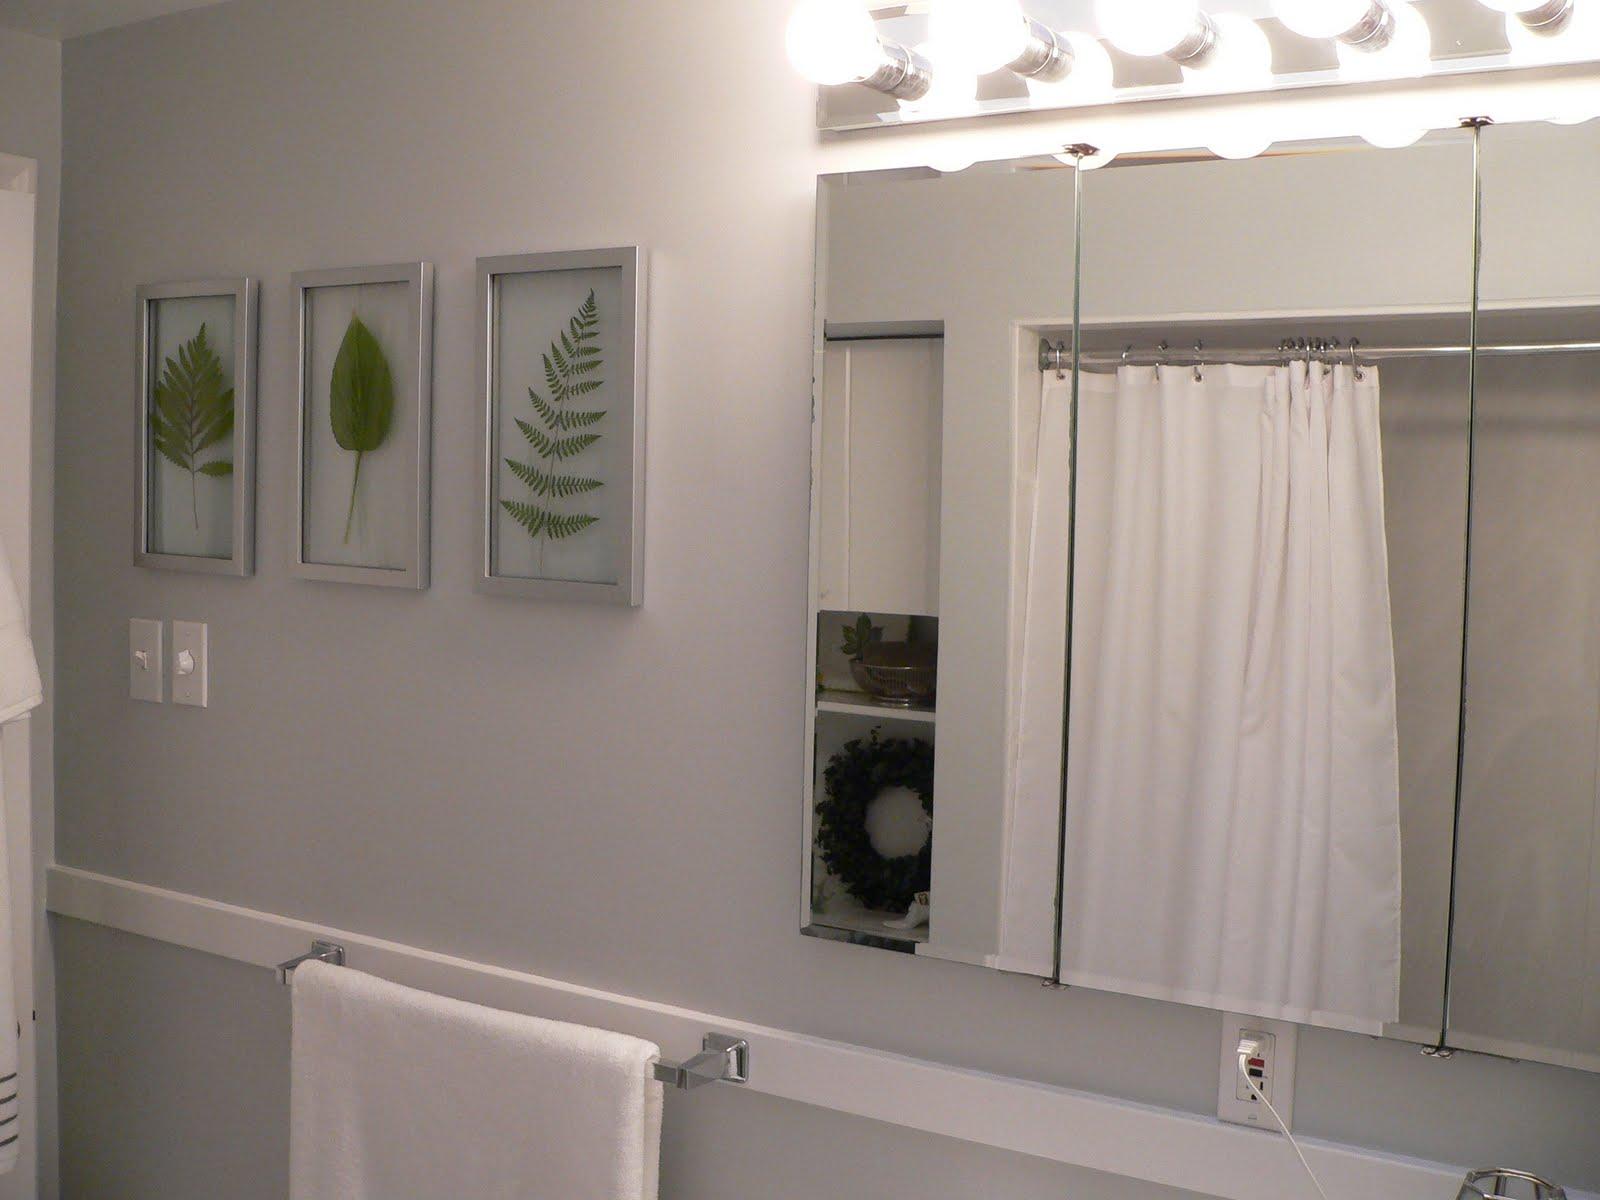 Make true the dreams of your youth idea gallery spa like bathroom - Simple ways making bathroom feel like mini spa ...